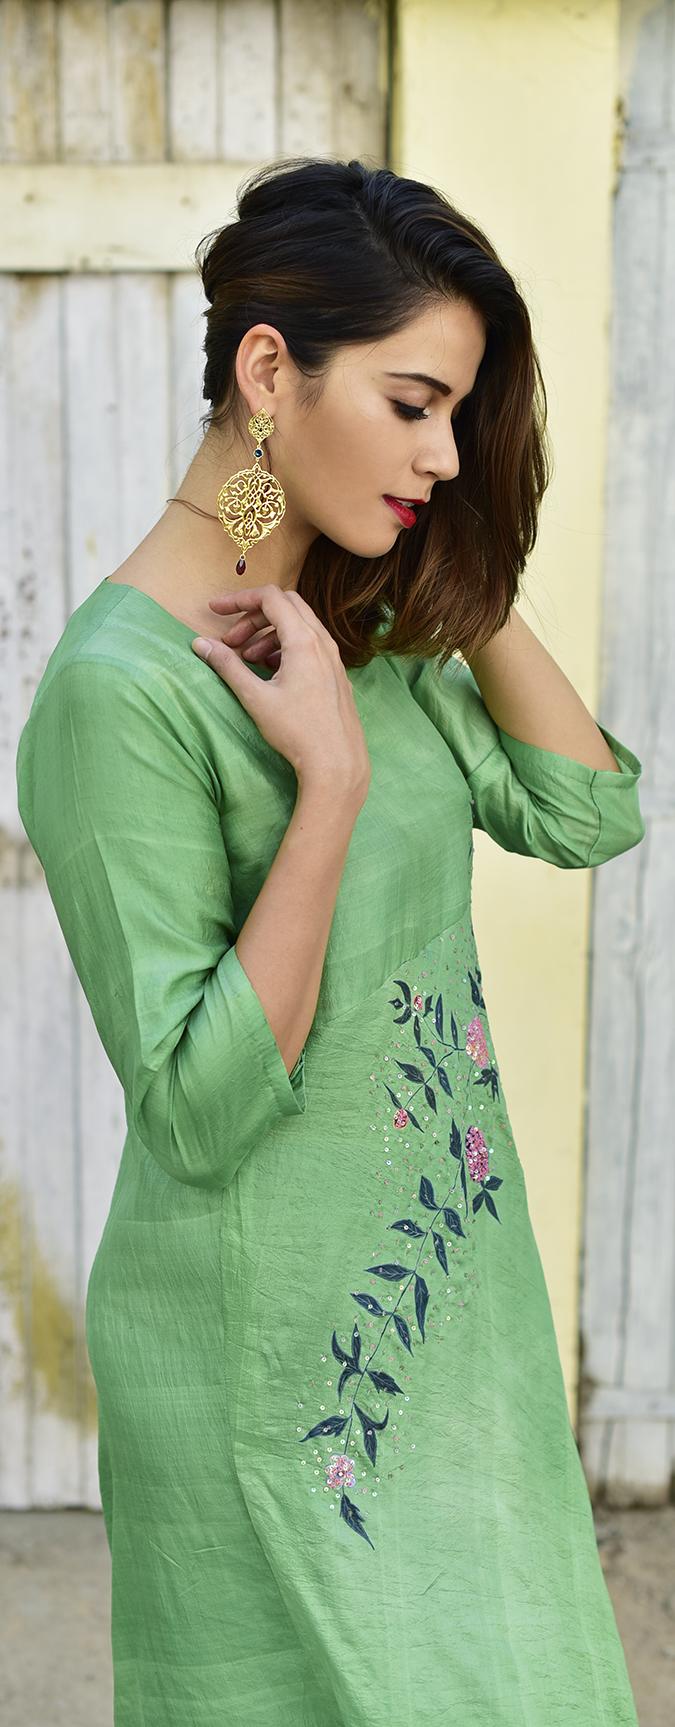 Bhusattva | Akanksha Redhu | half side long look down hair side